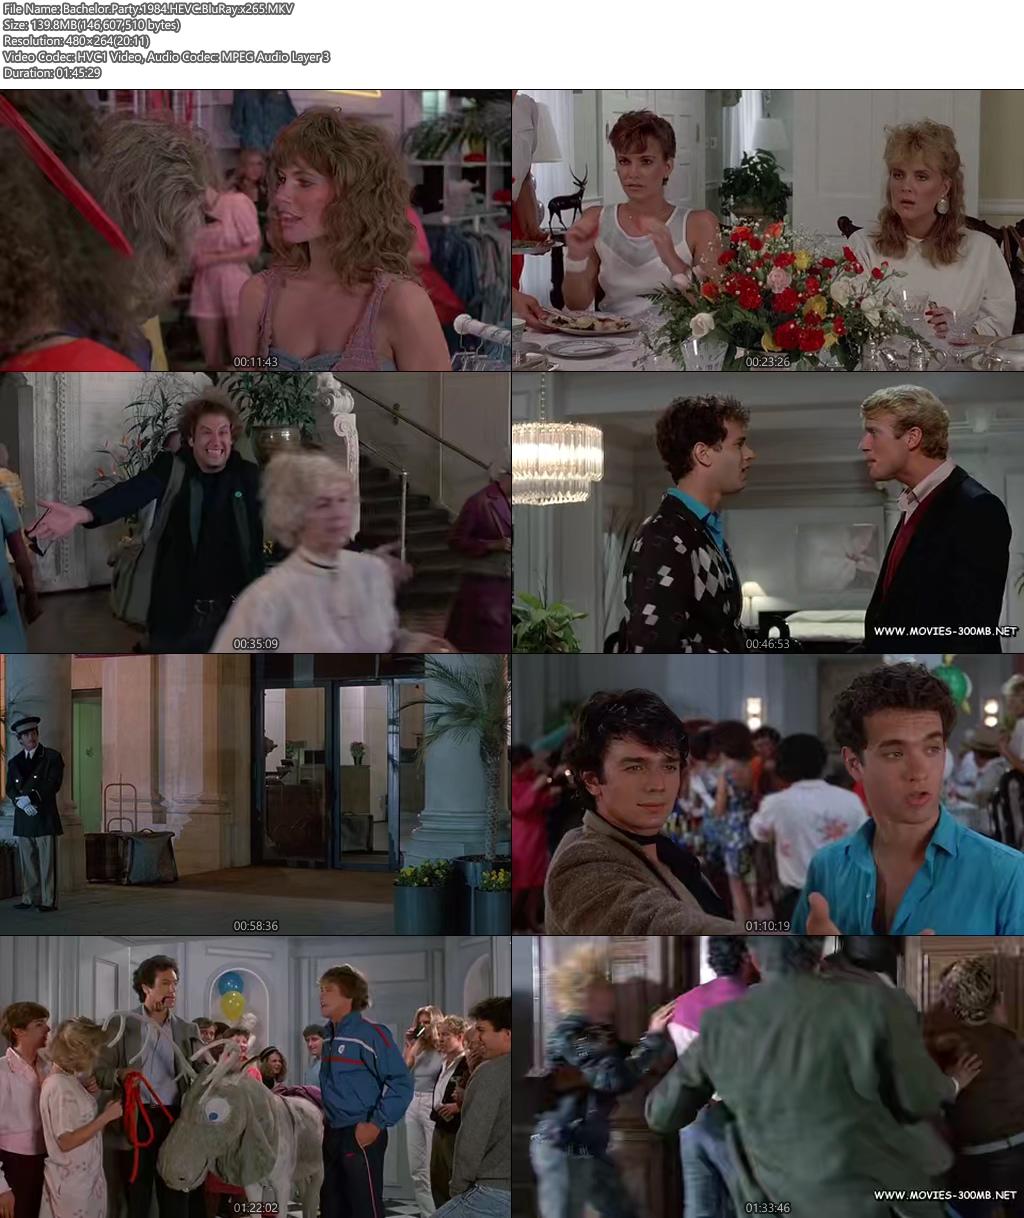 BachelorParty 1984 HEVC BluRay 100MB x265 Screenshot